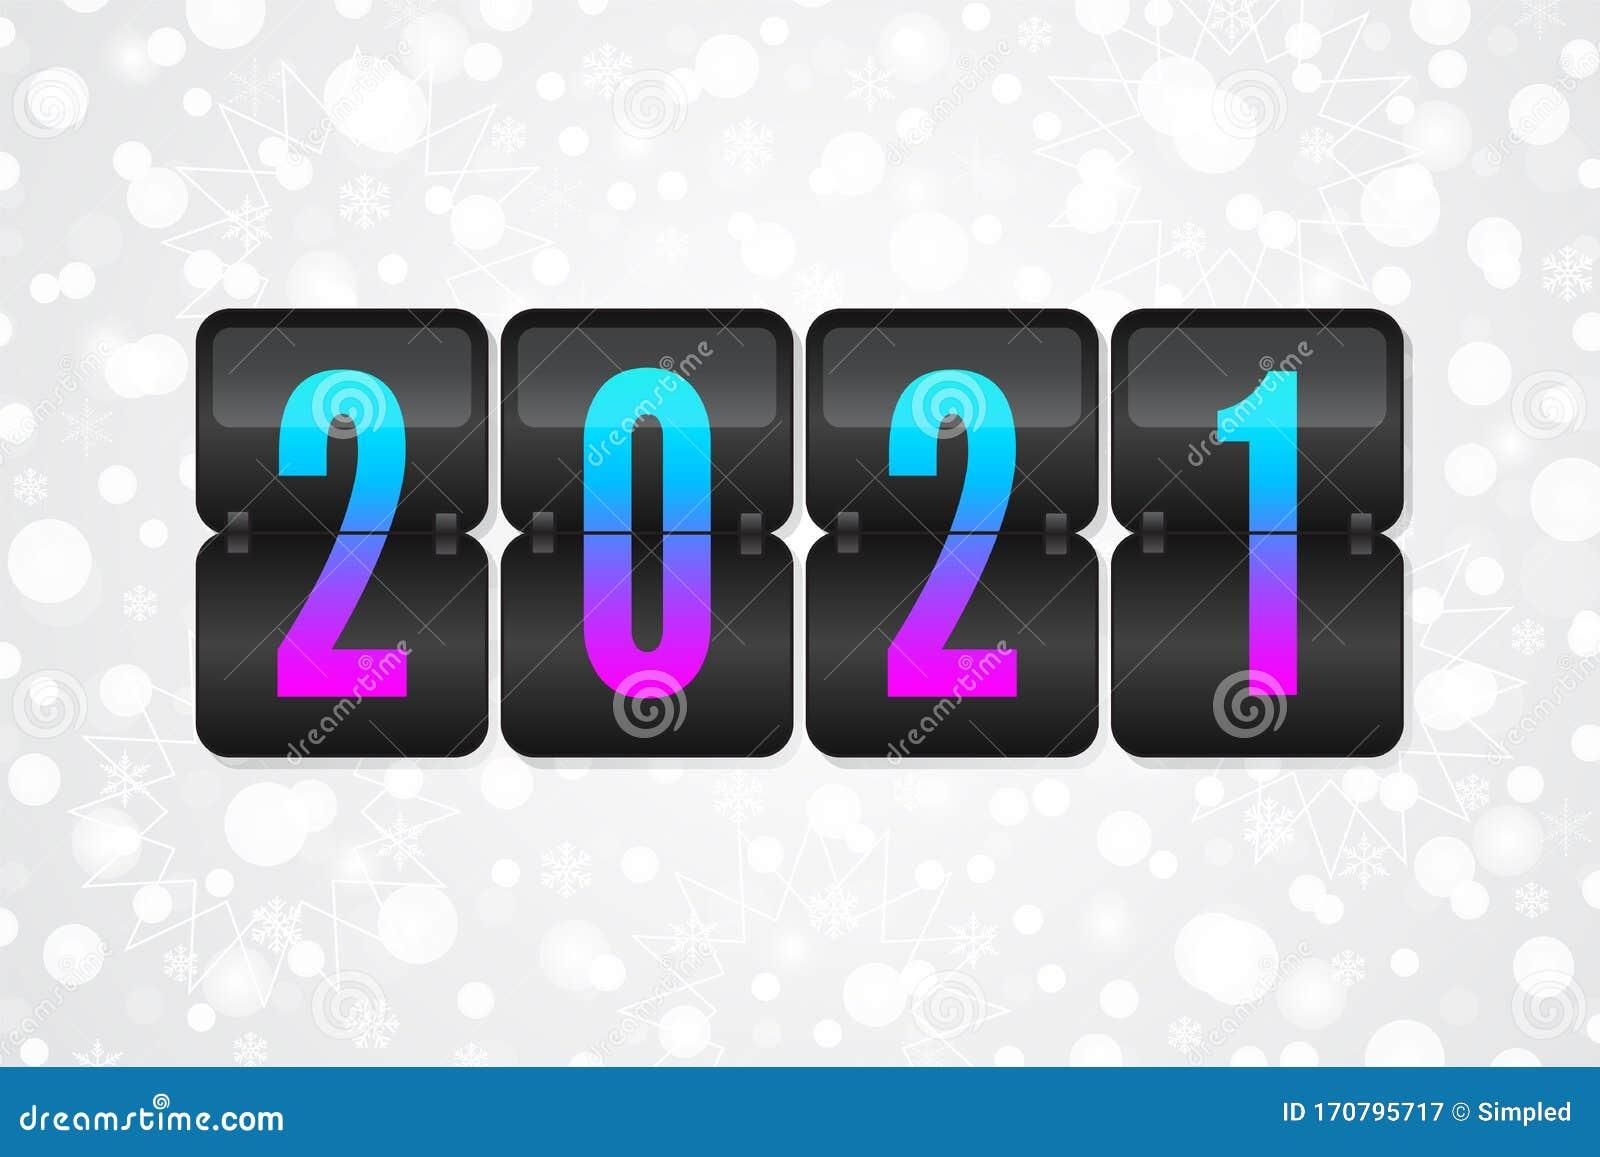 2021 New Year Scoreboard Sign On Christmas Snowflake ...